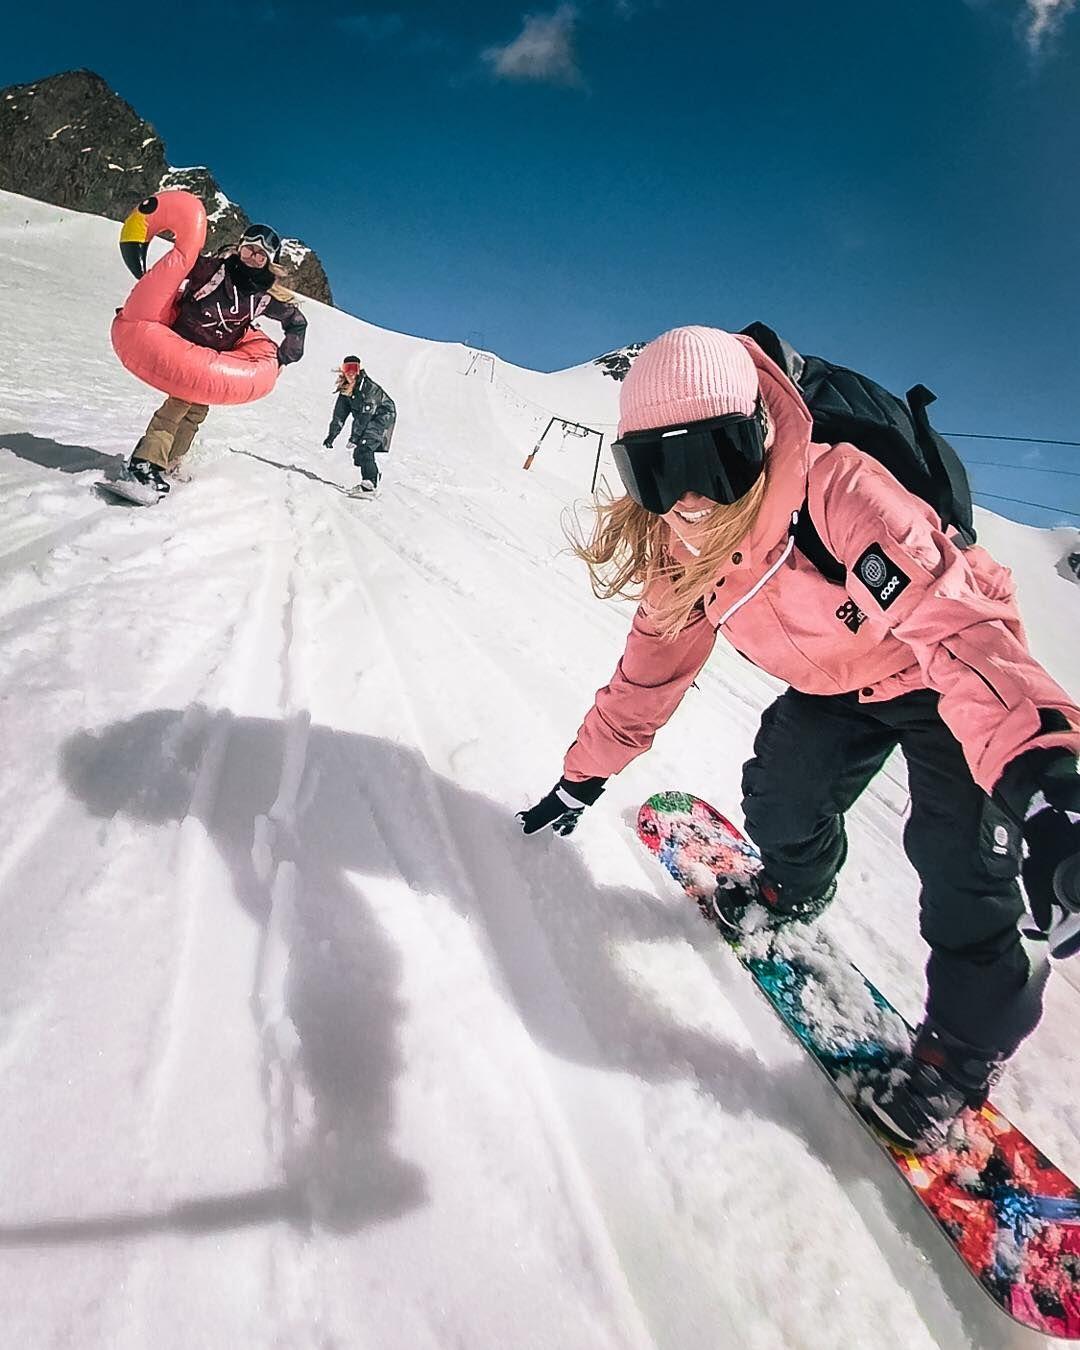 plus de photos 47f18 6a4d0 snowboard girl snowboarding women snowboarding outfit ...